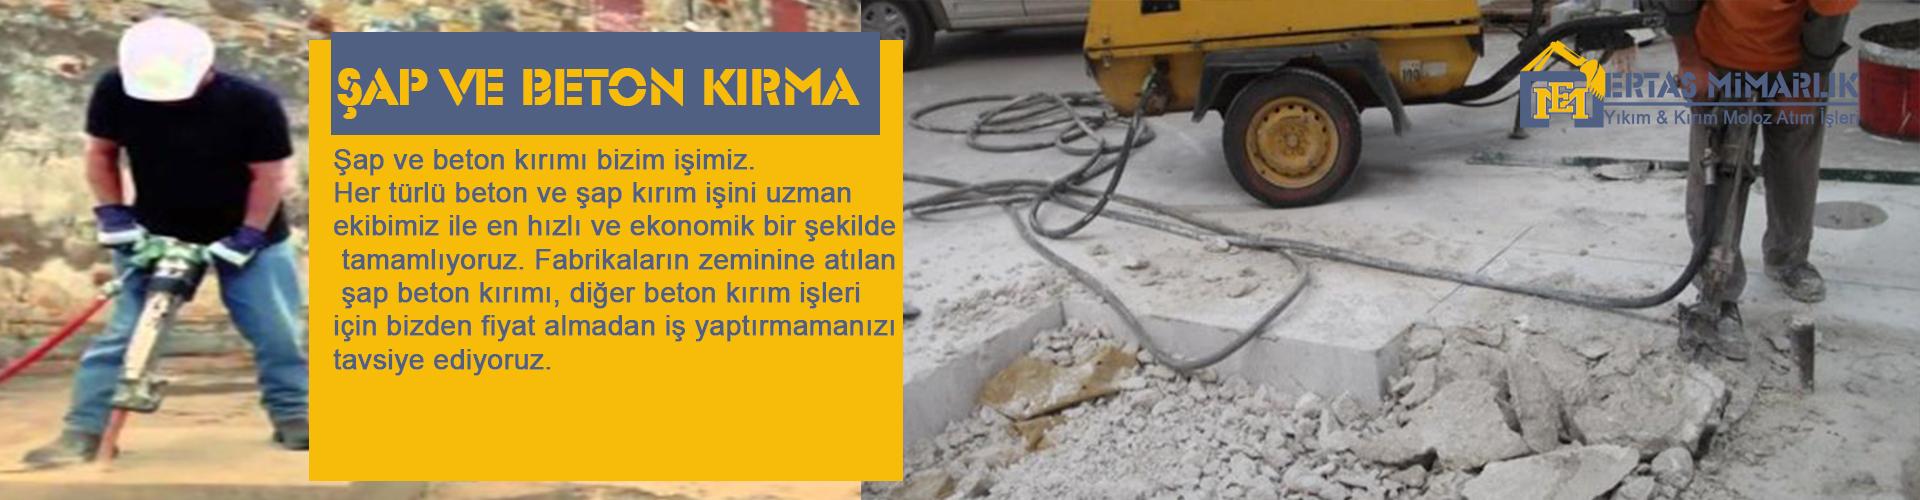 slide2_şap-beton-kırma